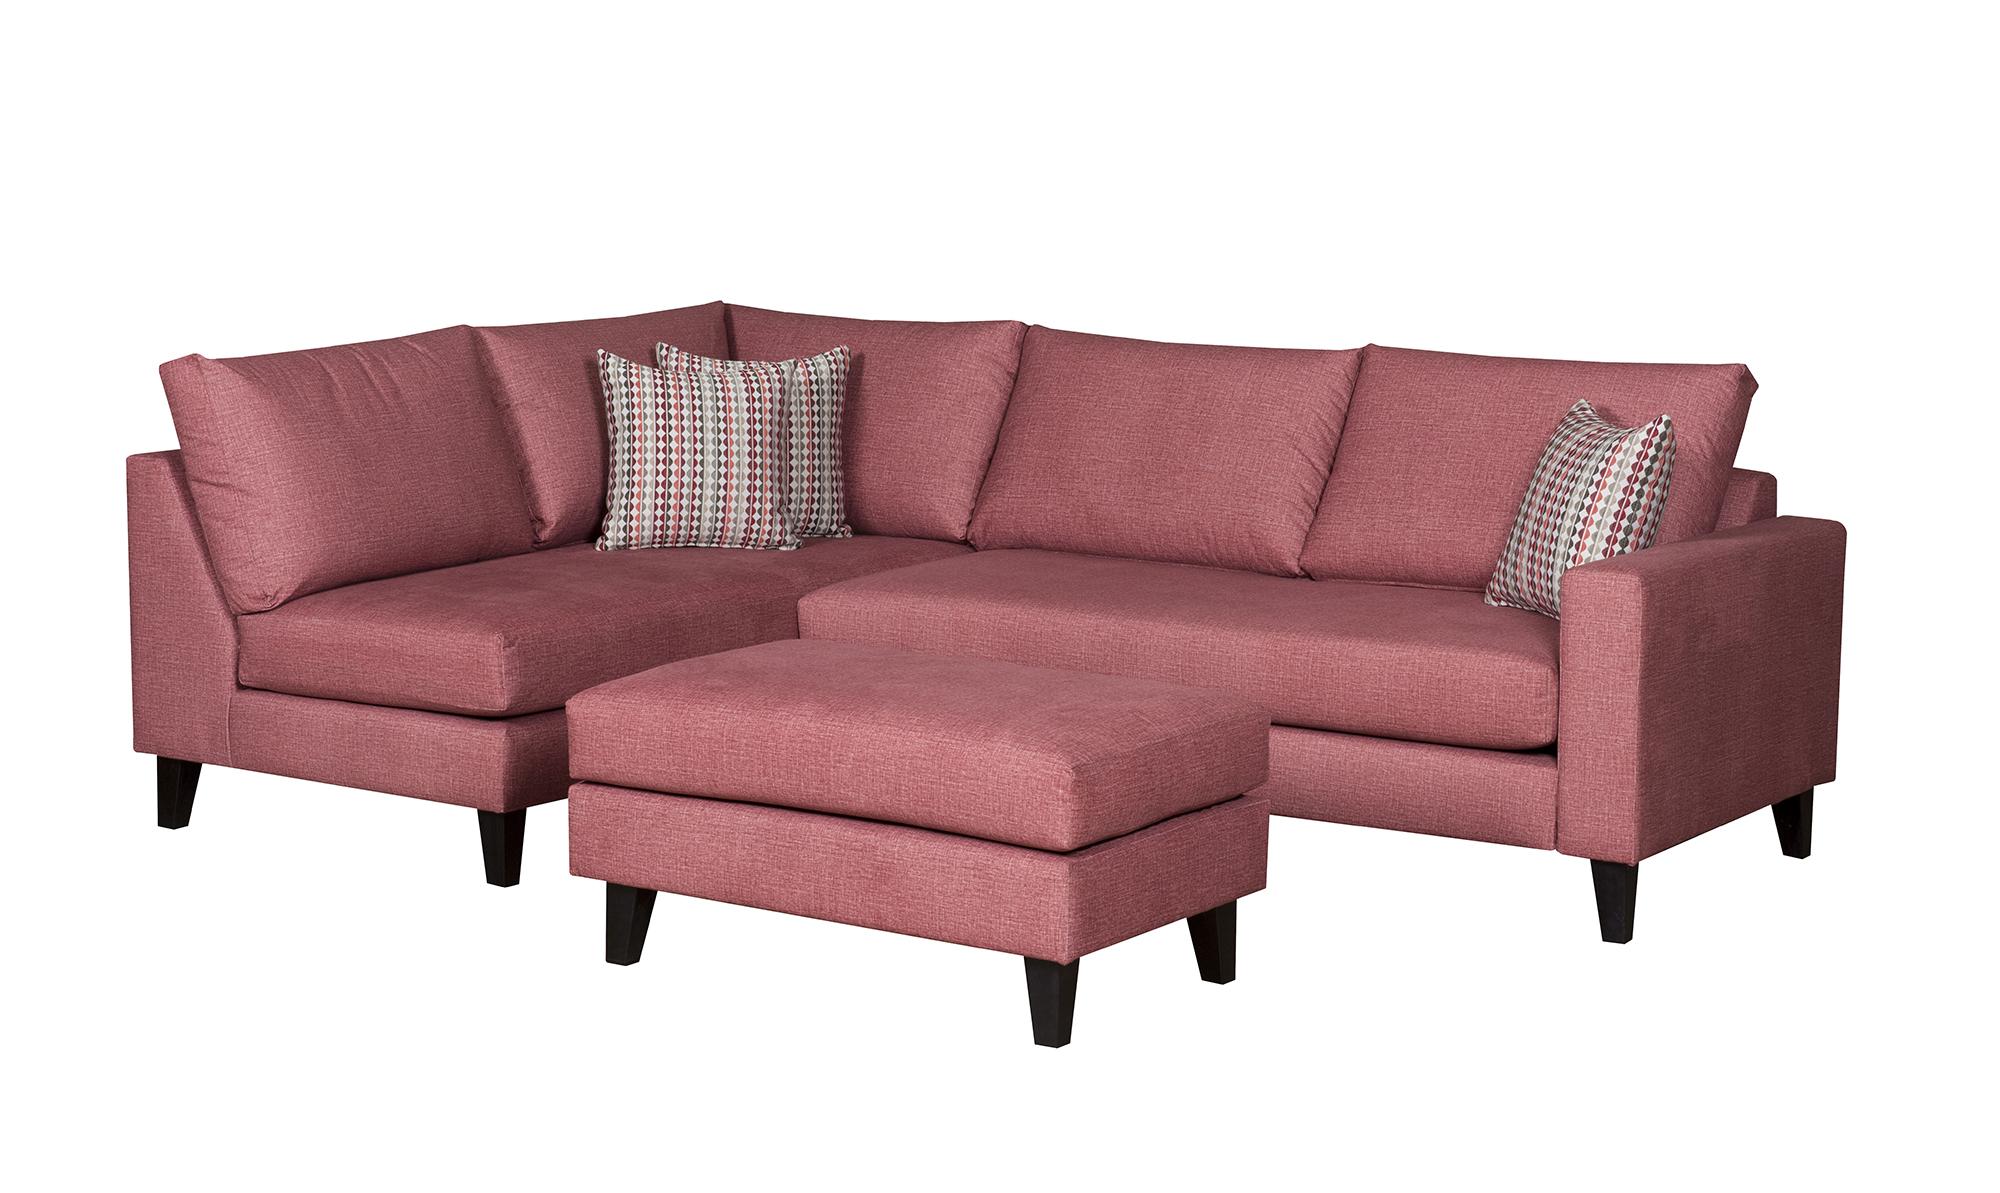 furniture lounge red 2